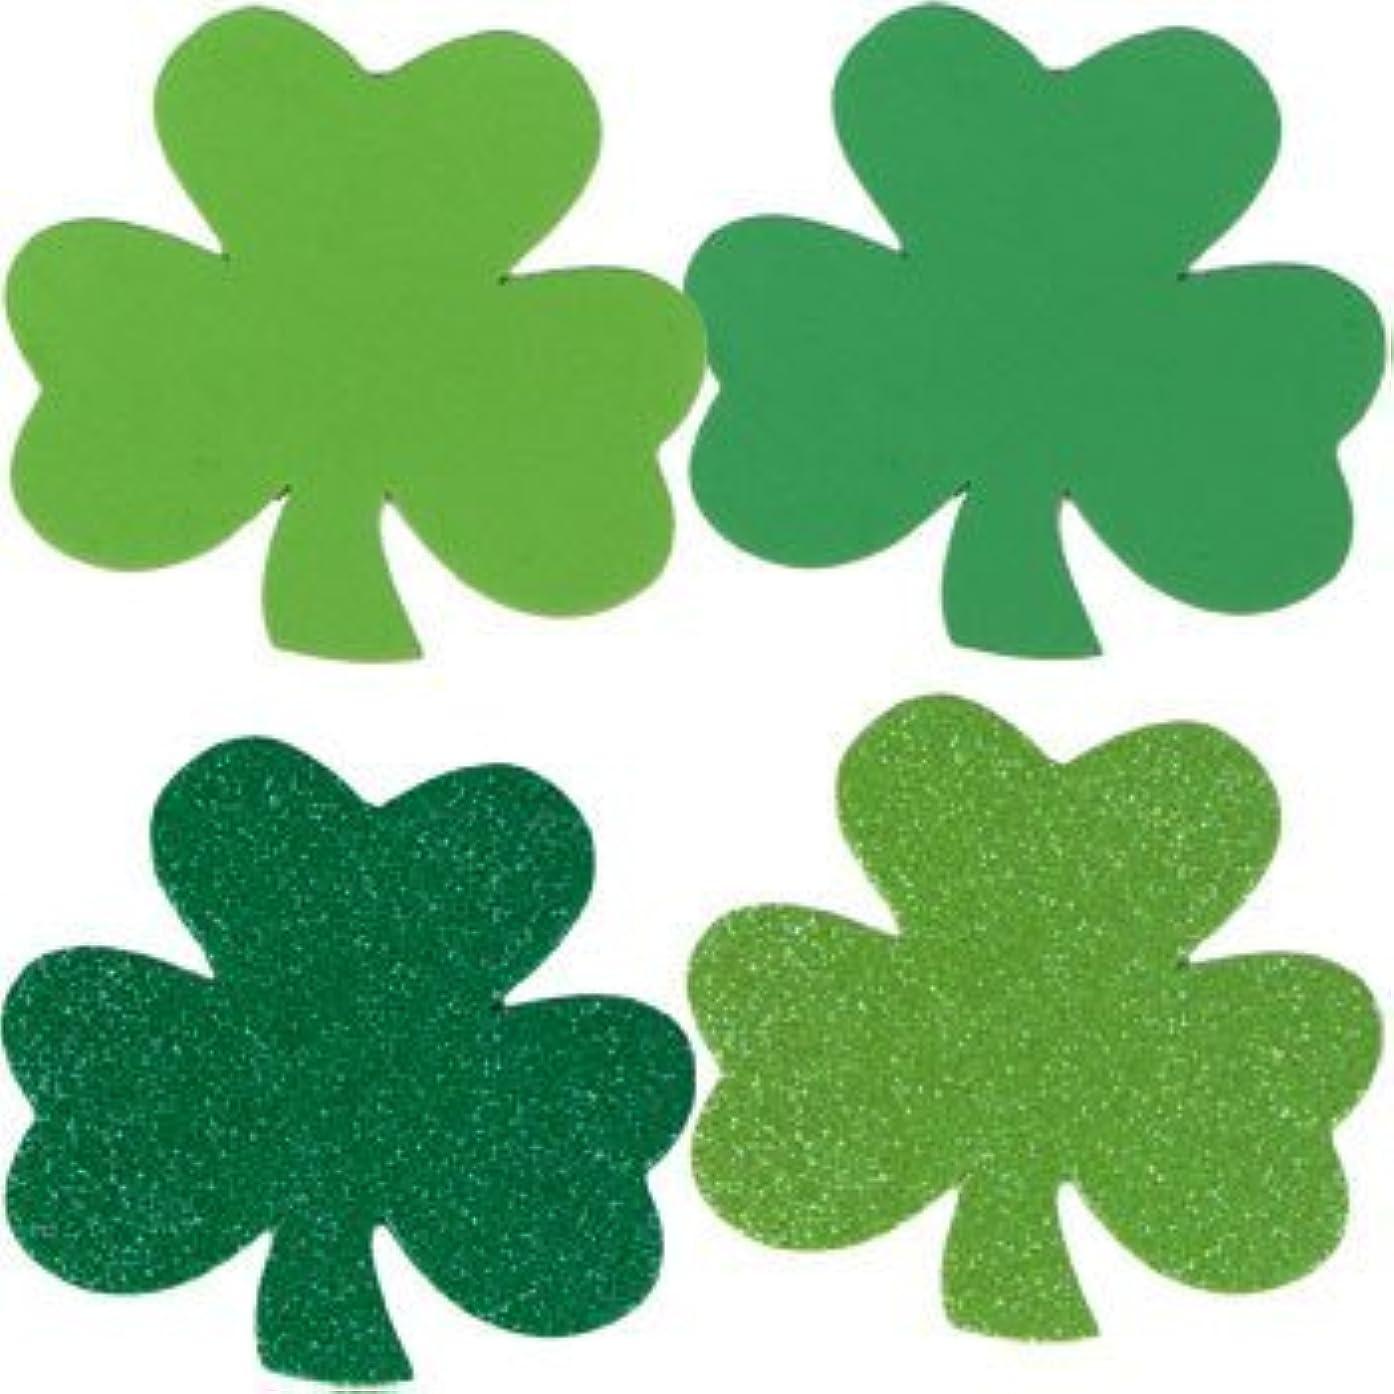 St. Patricks Day Decorations - 4 Foam Shamrocks - 12 Per Pack